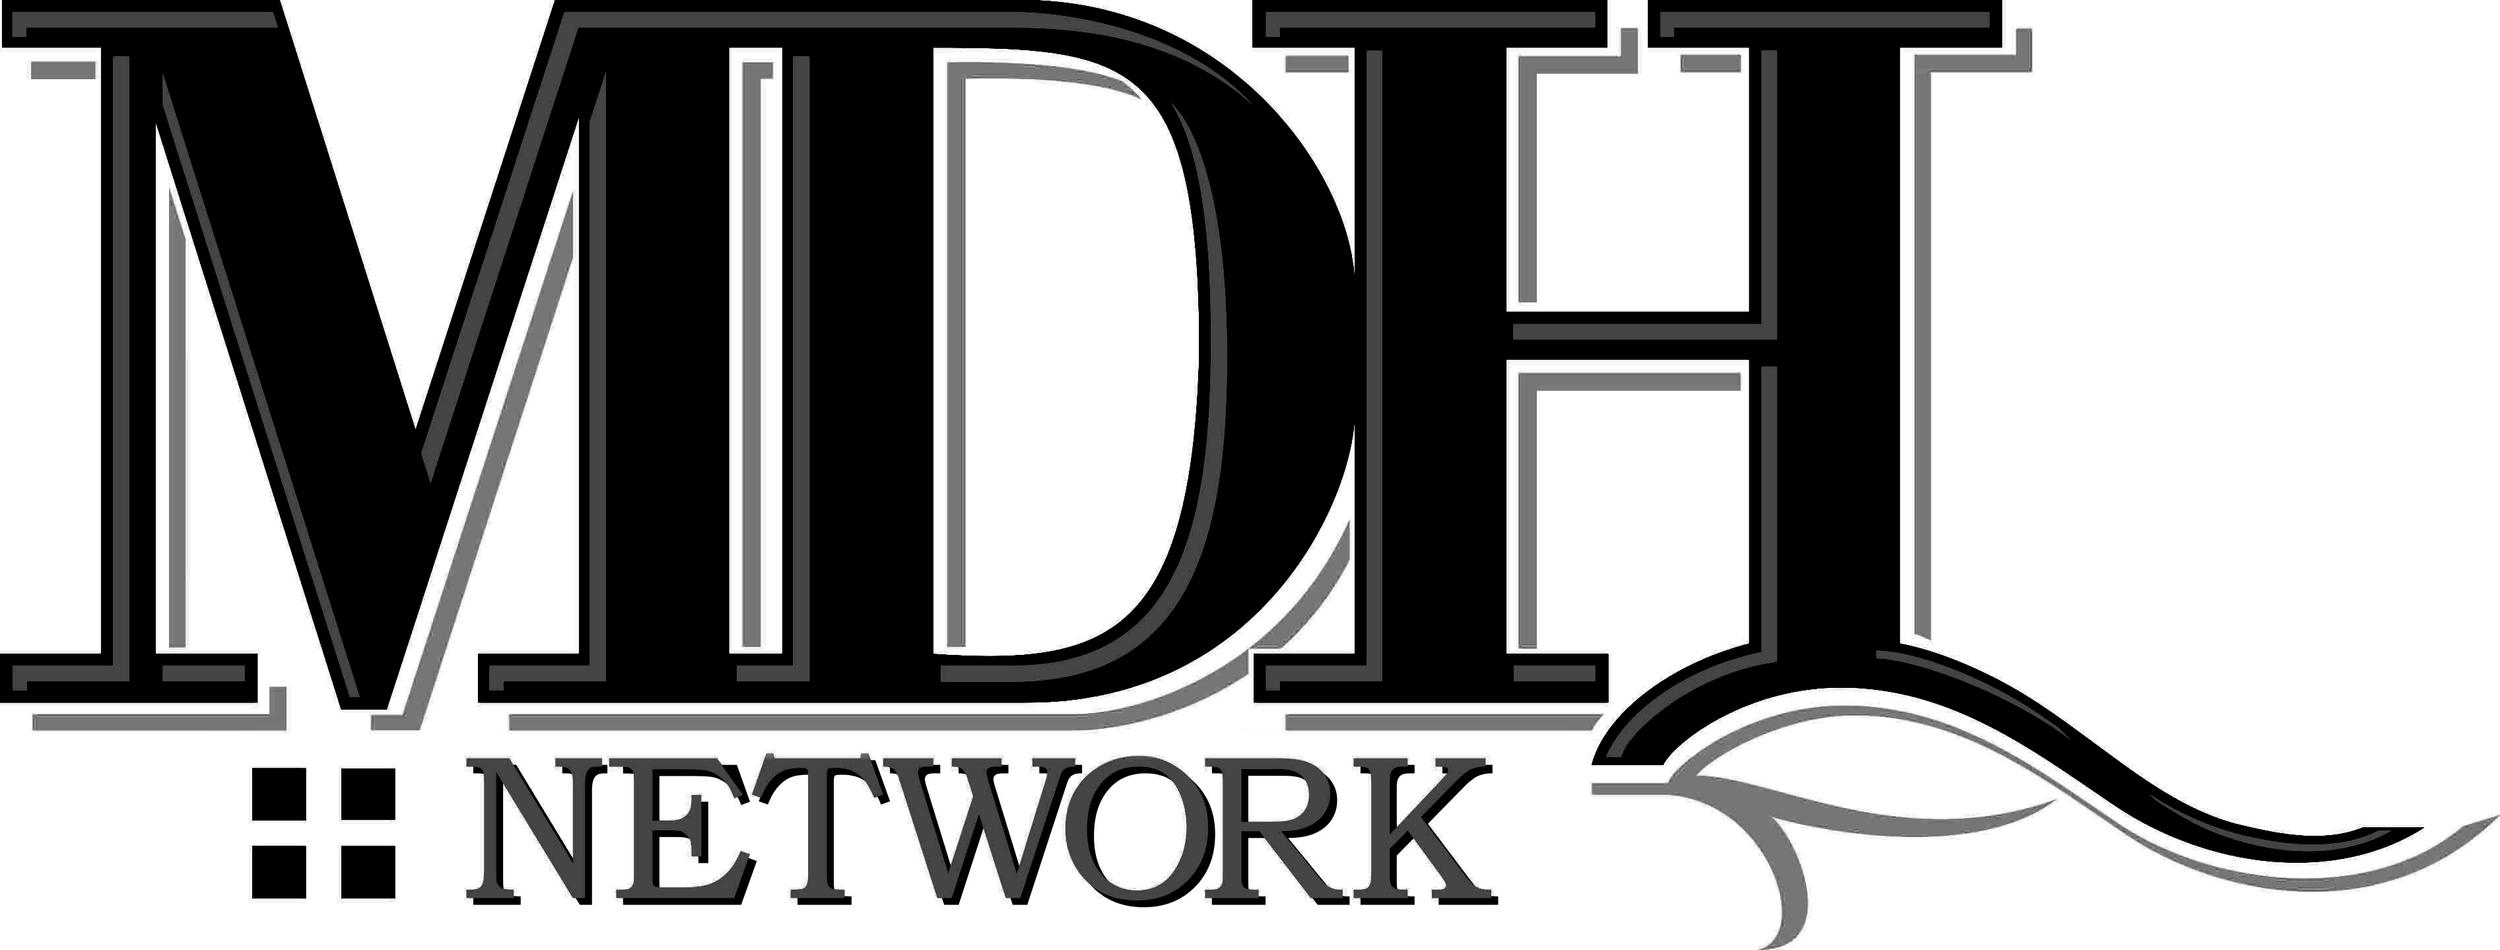 MDH Network Final Logo Black & White.jpg